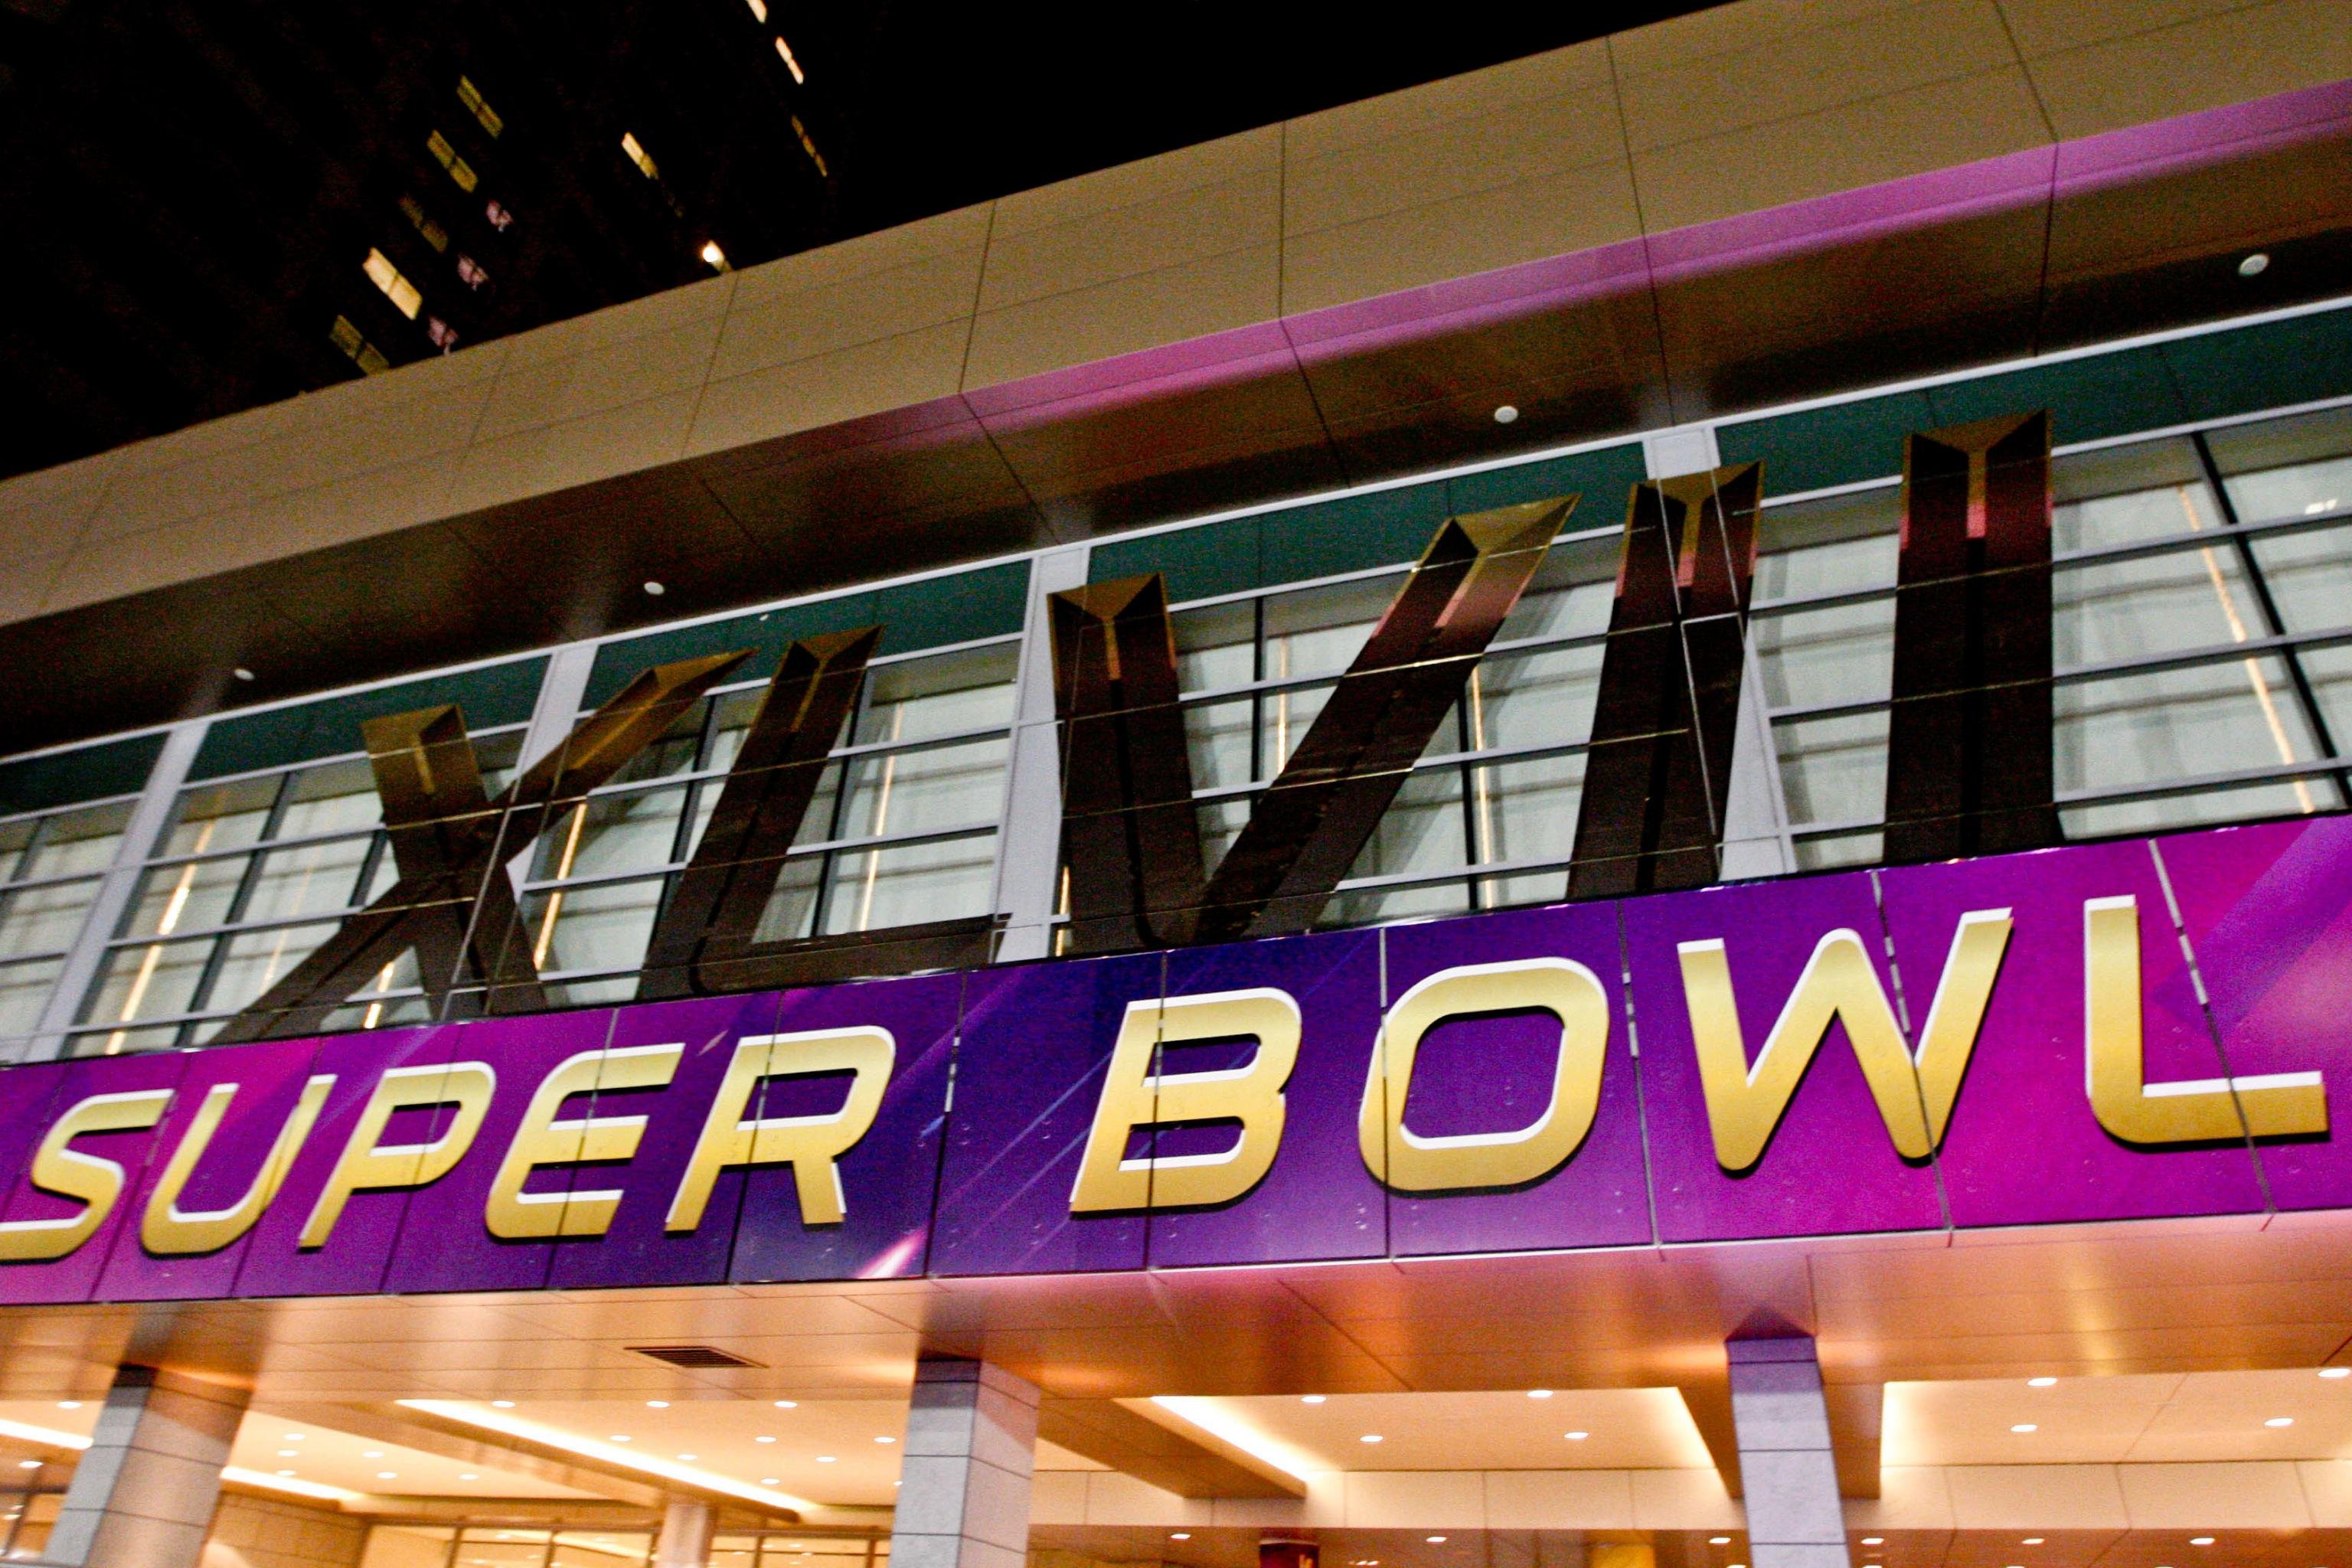 Things to bet on super bowl 2013 sbr betting consensus picks